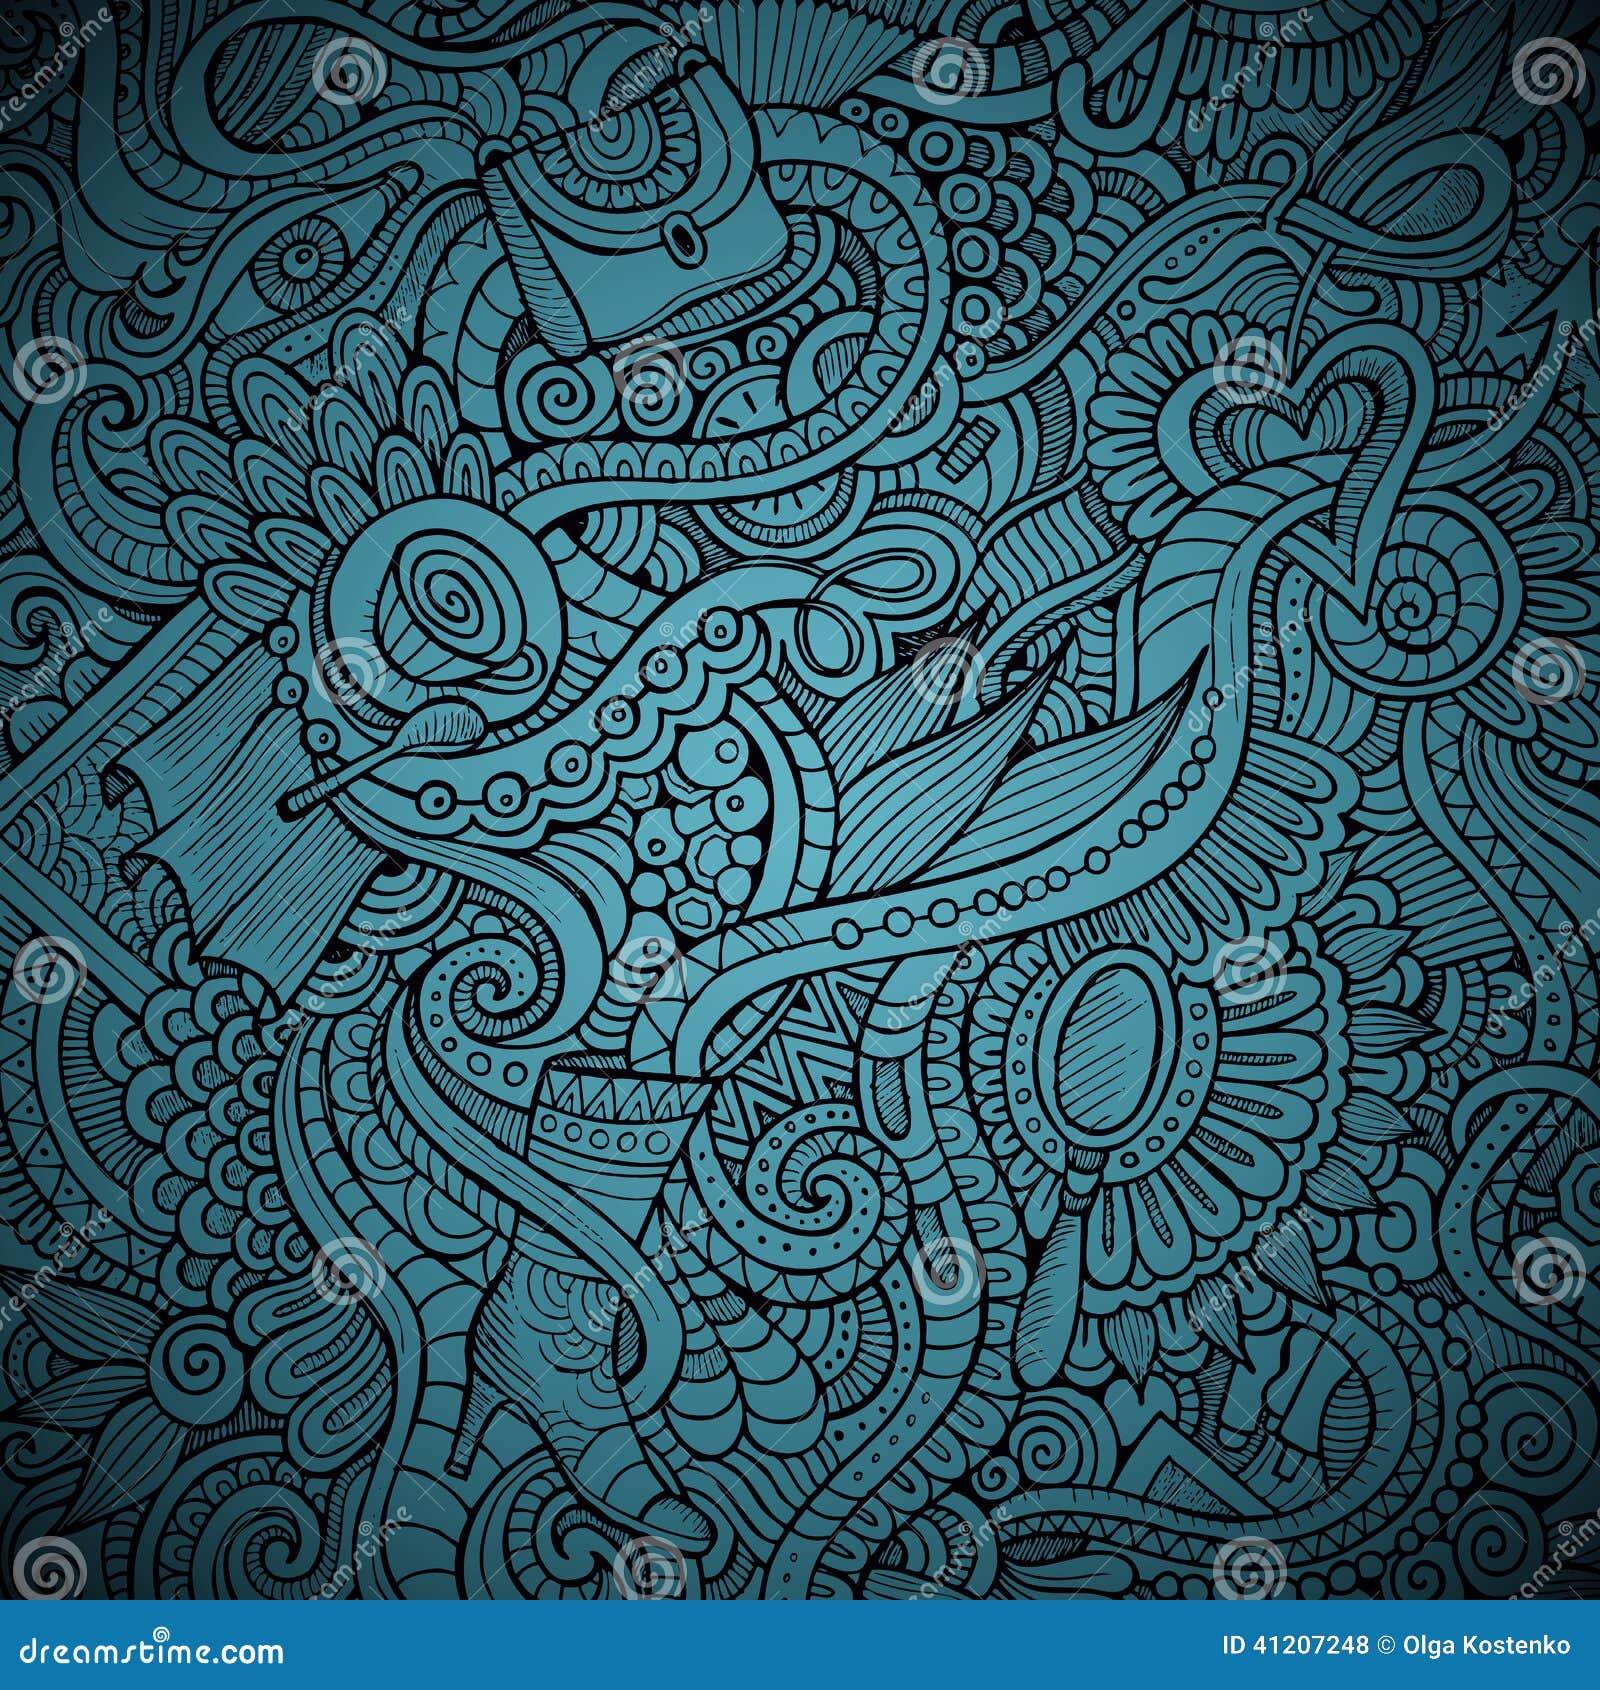 Vector fashion decorative doodles background